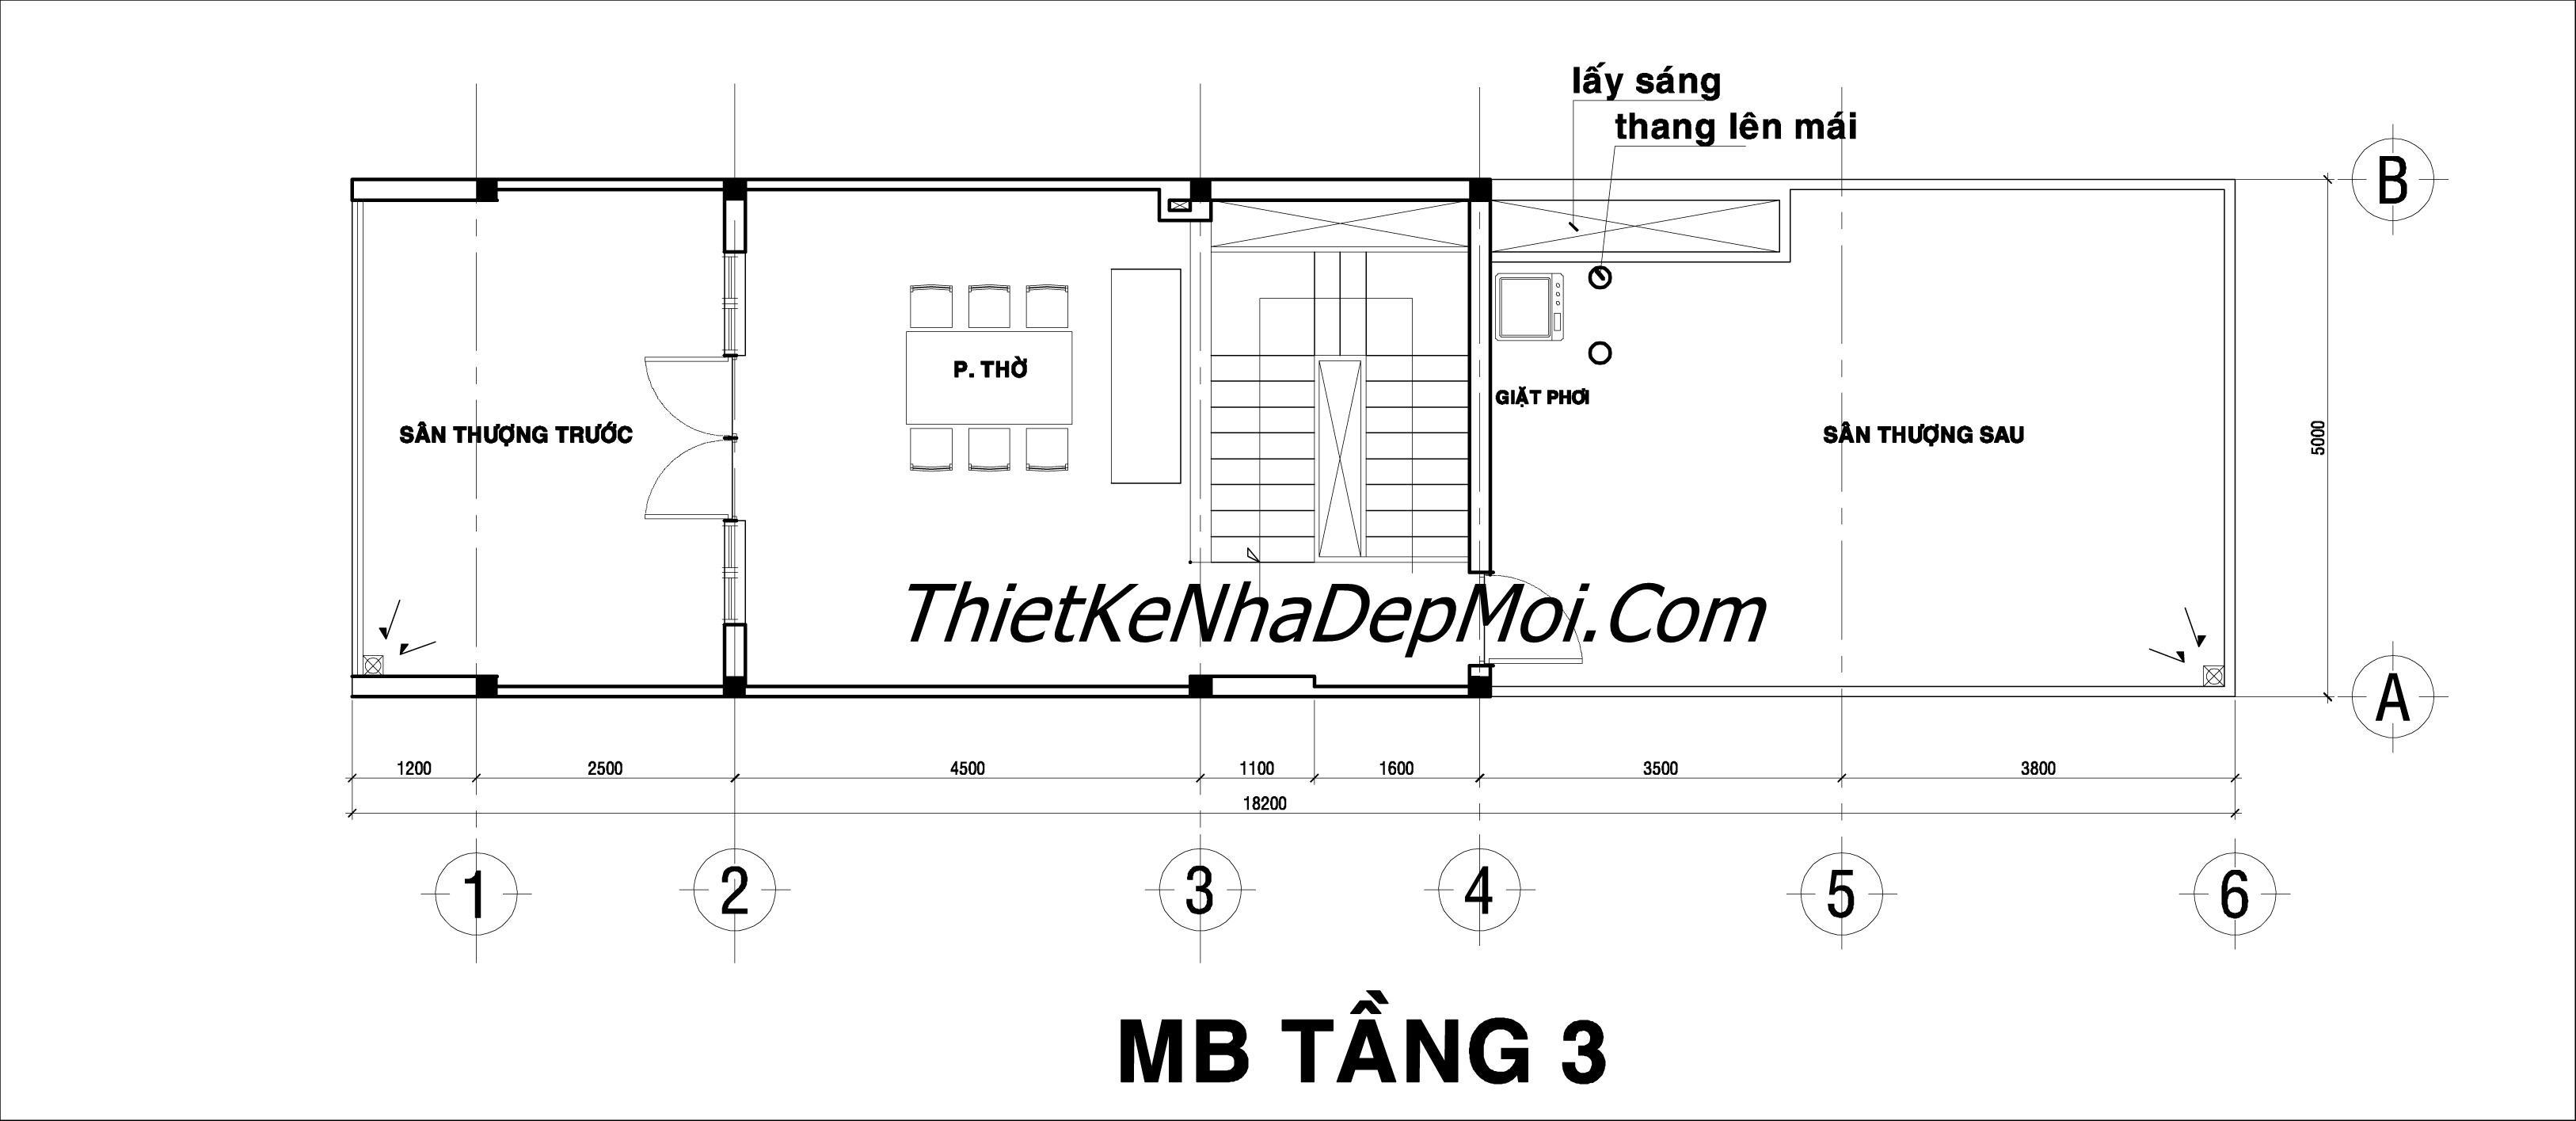 mau-nha-ong-dep-3-tang-1631